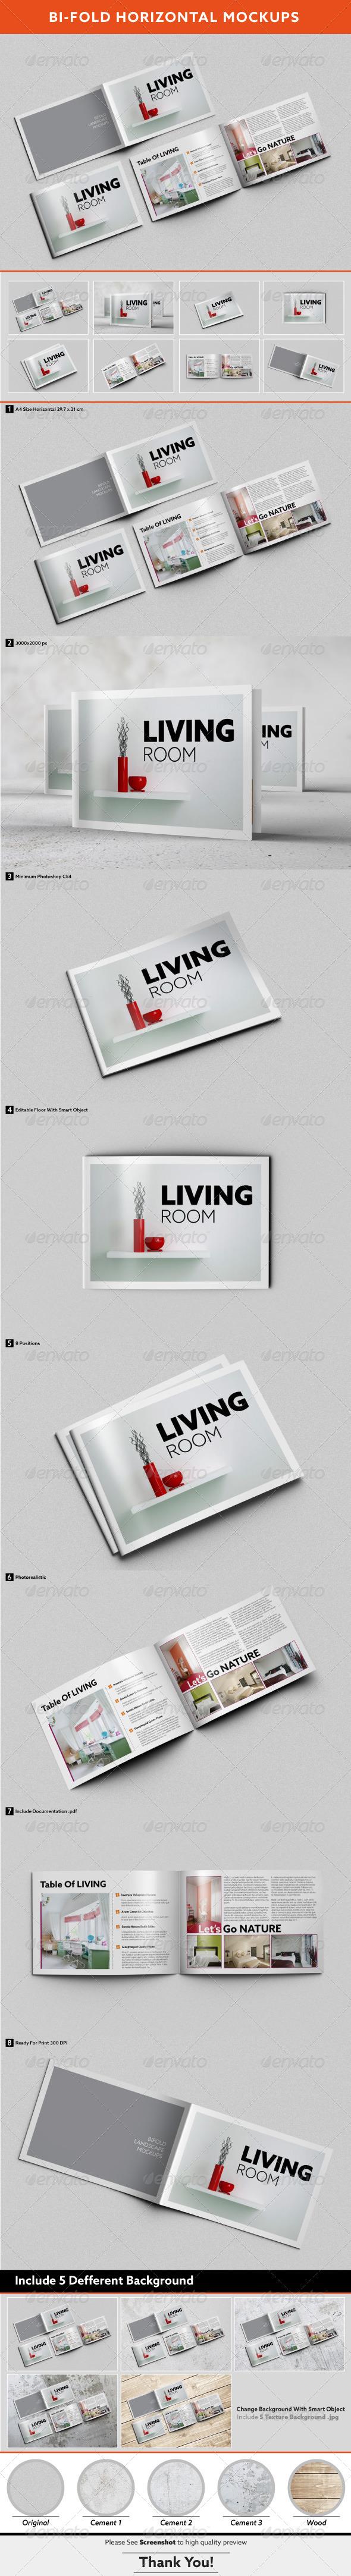 GraphicRiver Bi-fold Horizontal Brochure Mockups 7870258